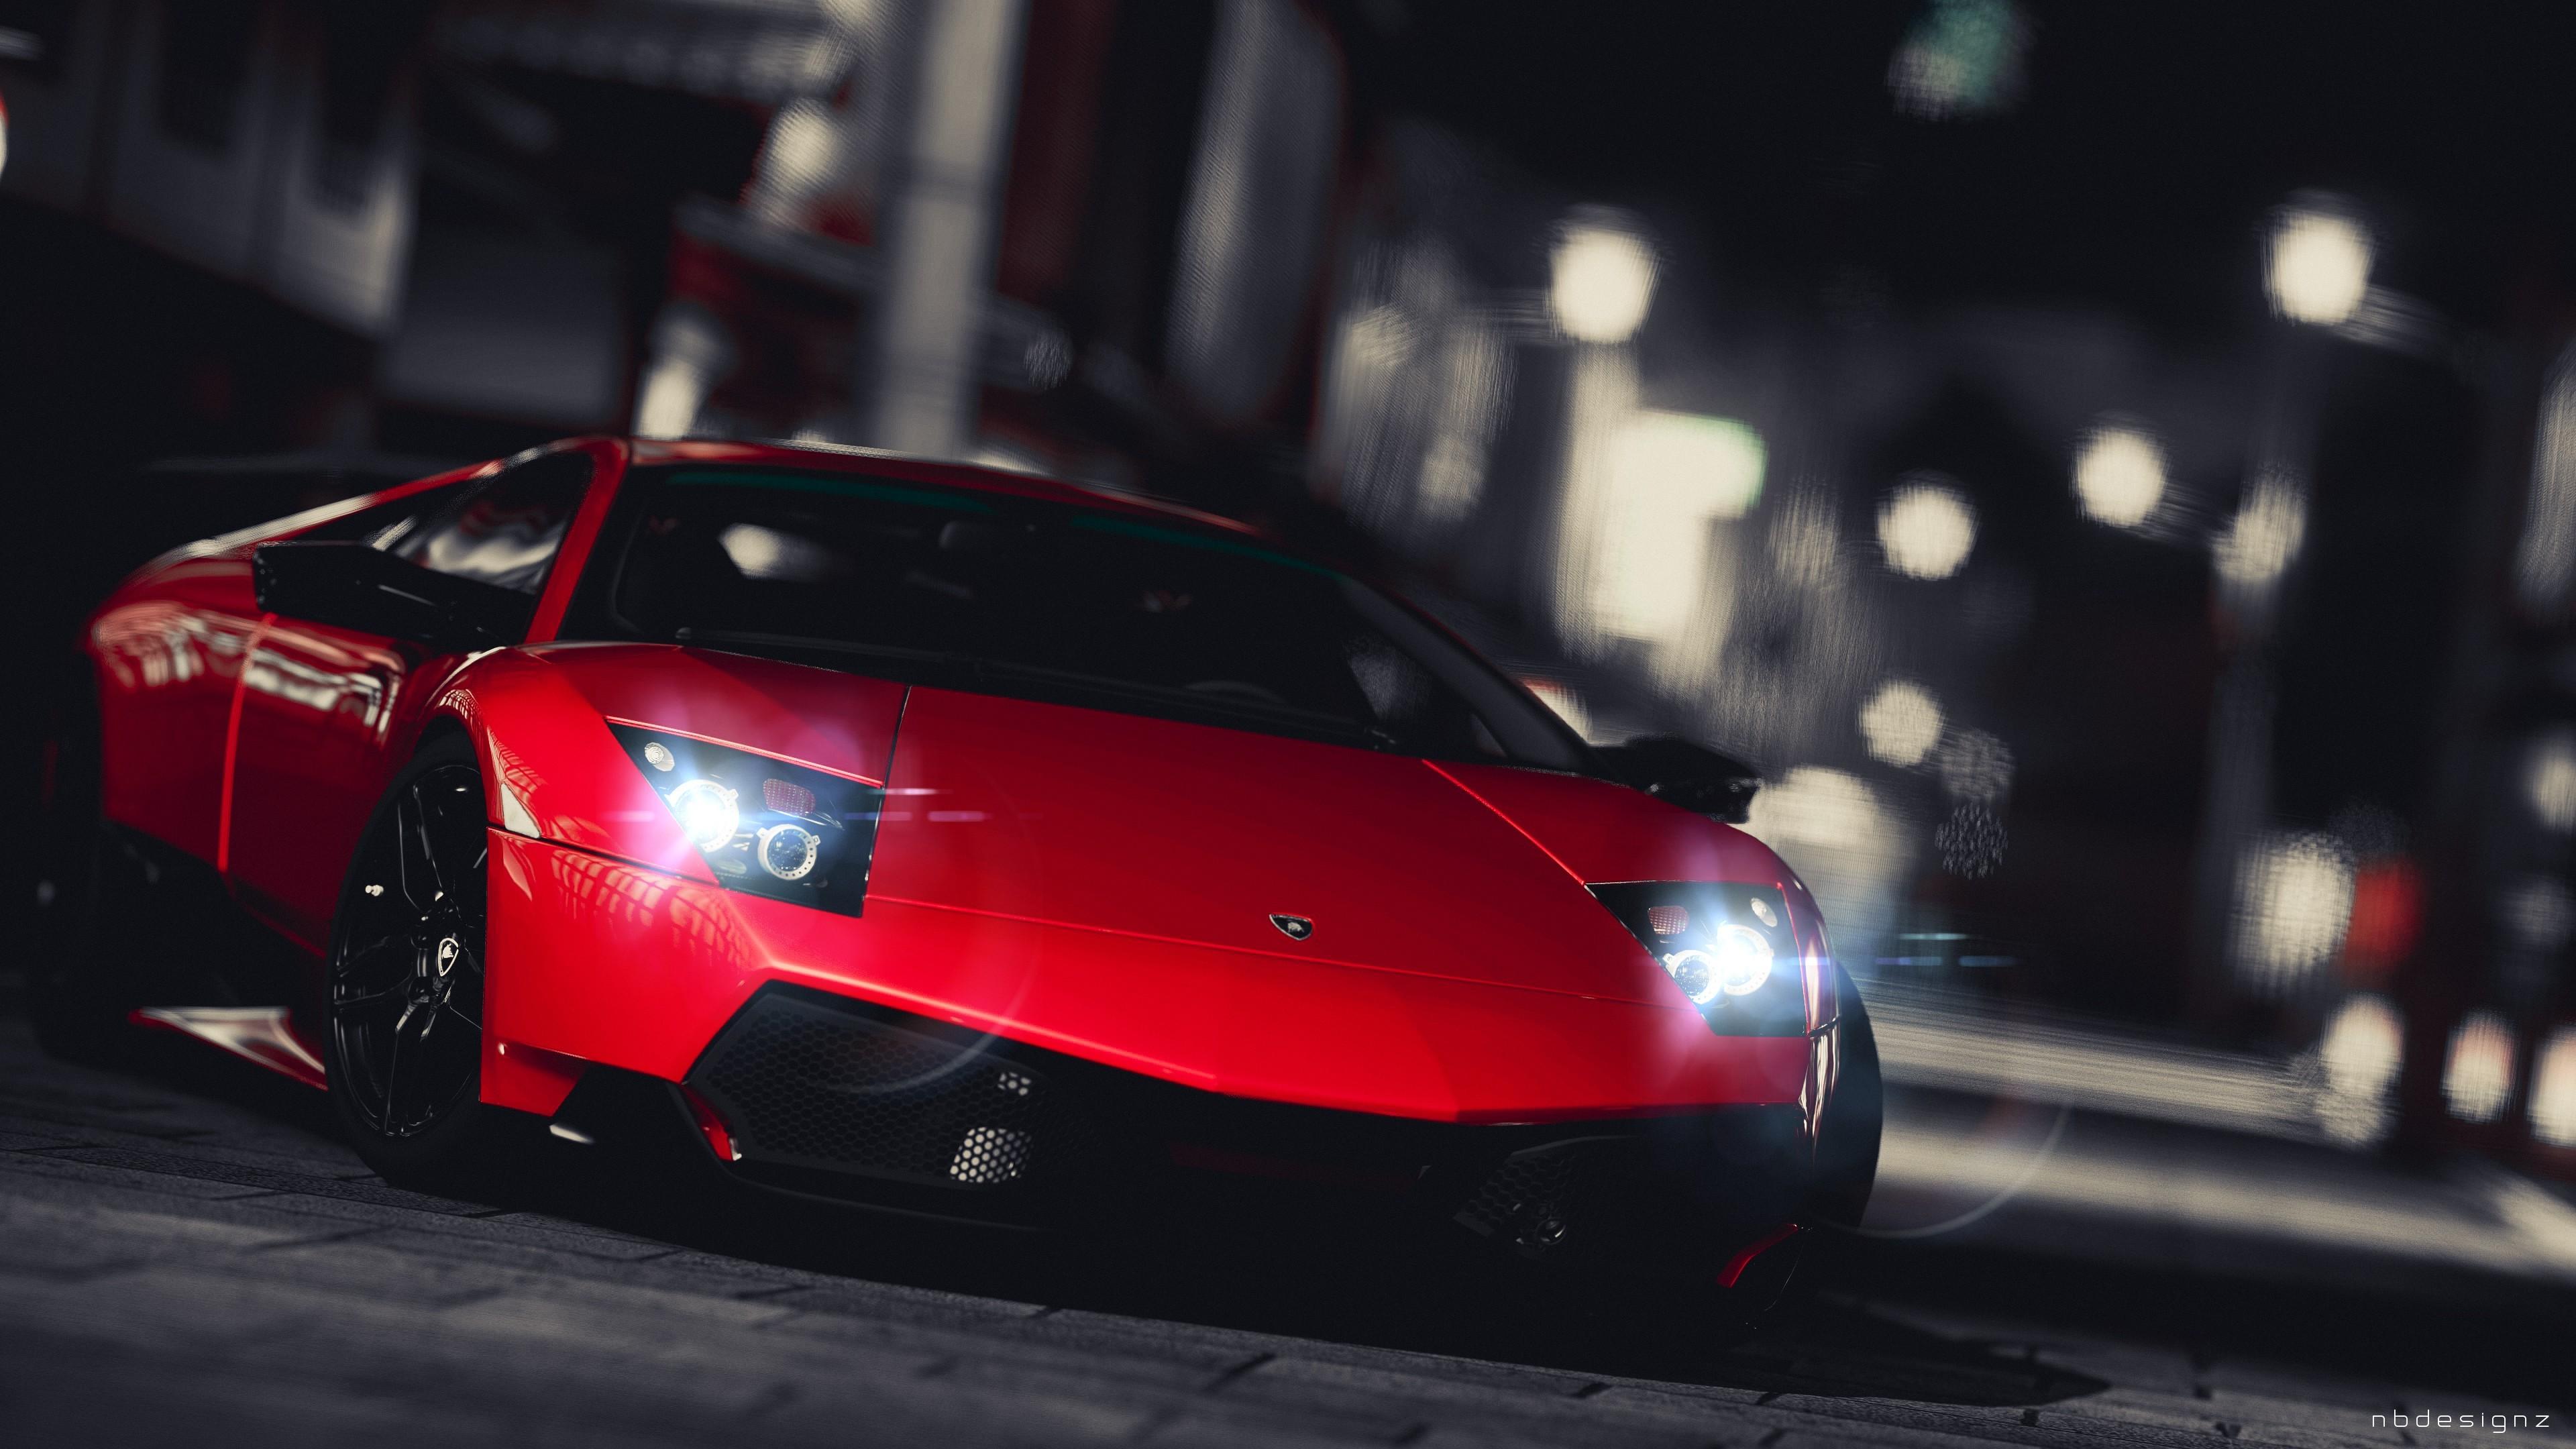 Wallpaper 3840x2160 Px Car Gran Turismo 5 Lamborghini